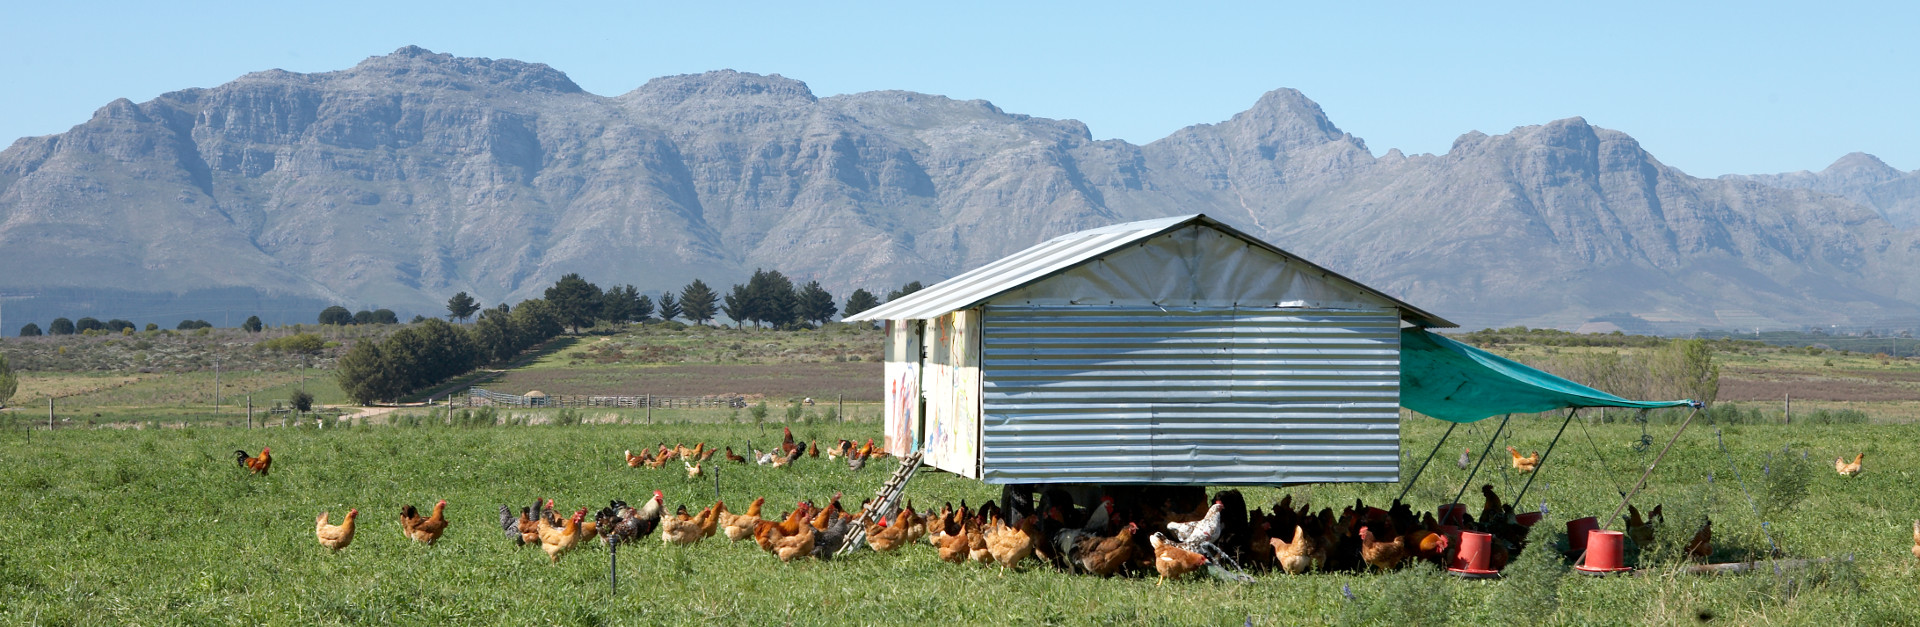 Cape Winelands audio tour: Walk The Spier Farm: Wine Tasting Room